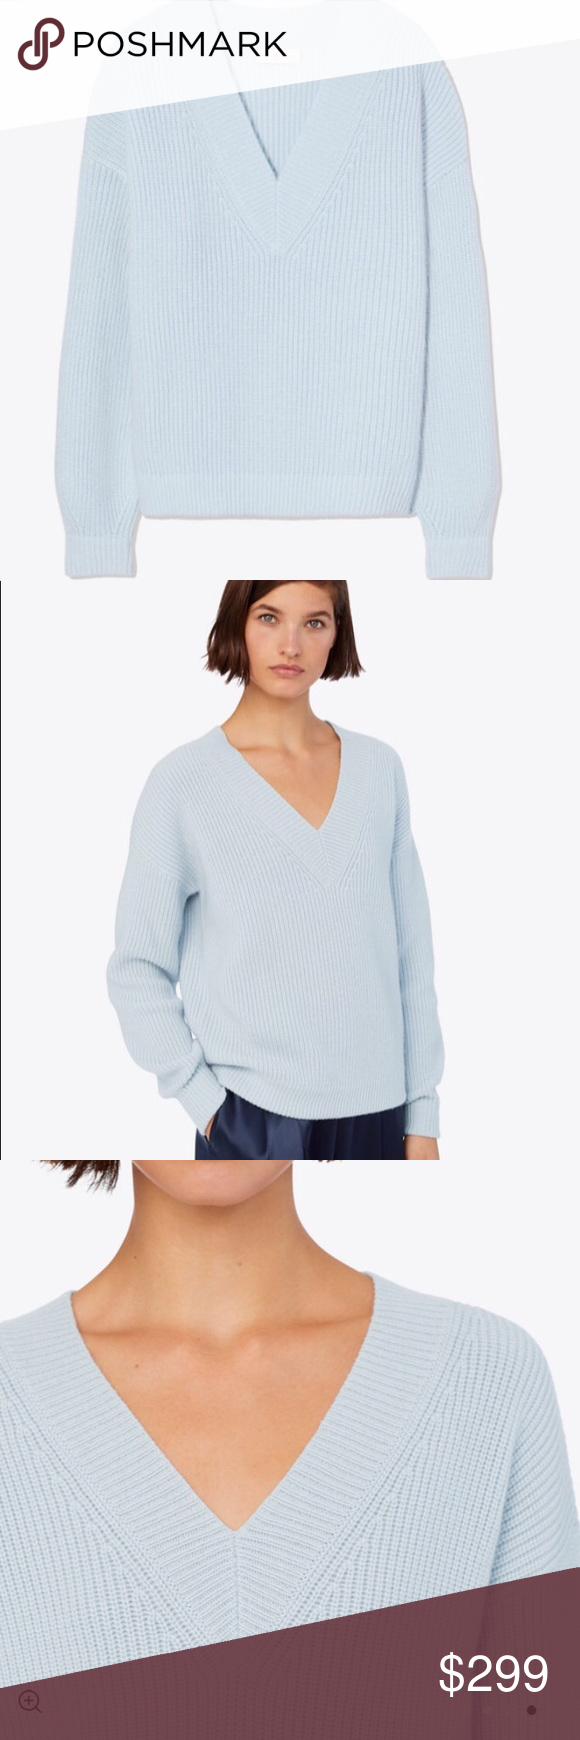 cdf29e4f943 Light blue oversized V neck sweater Tory Burch light blue oversized v-neck  sweater